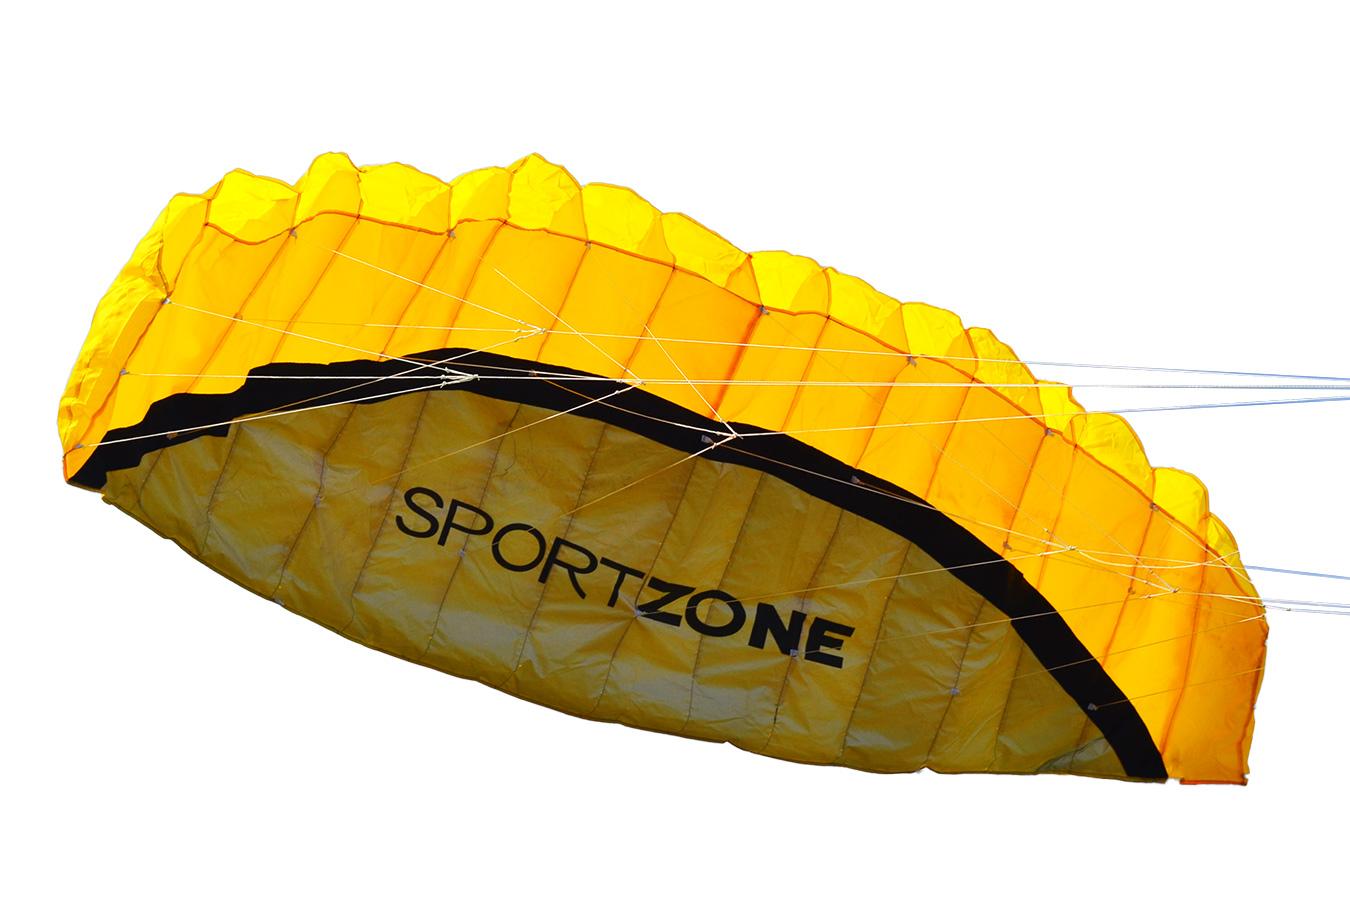 Энергия неба SportZone 2.5, пилотажный кайт [KP25Z]